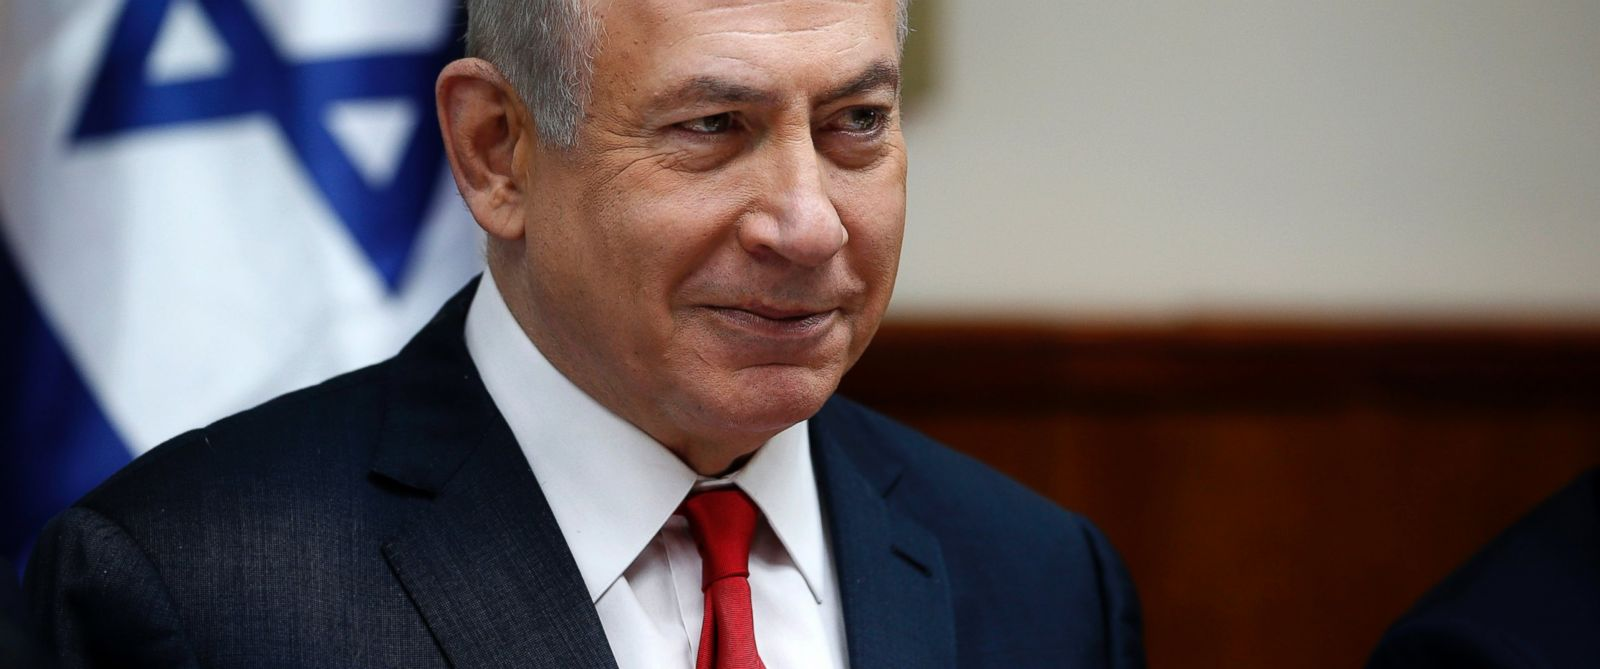 PHOTO: Israeli Prime Minister Benjamin Netanyahu attends the weekly cabinet meeting in Jerusalem, Jan. 22, 2017.